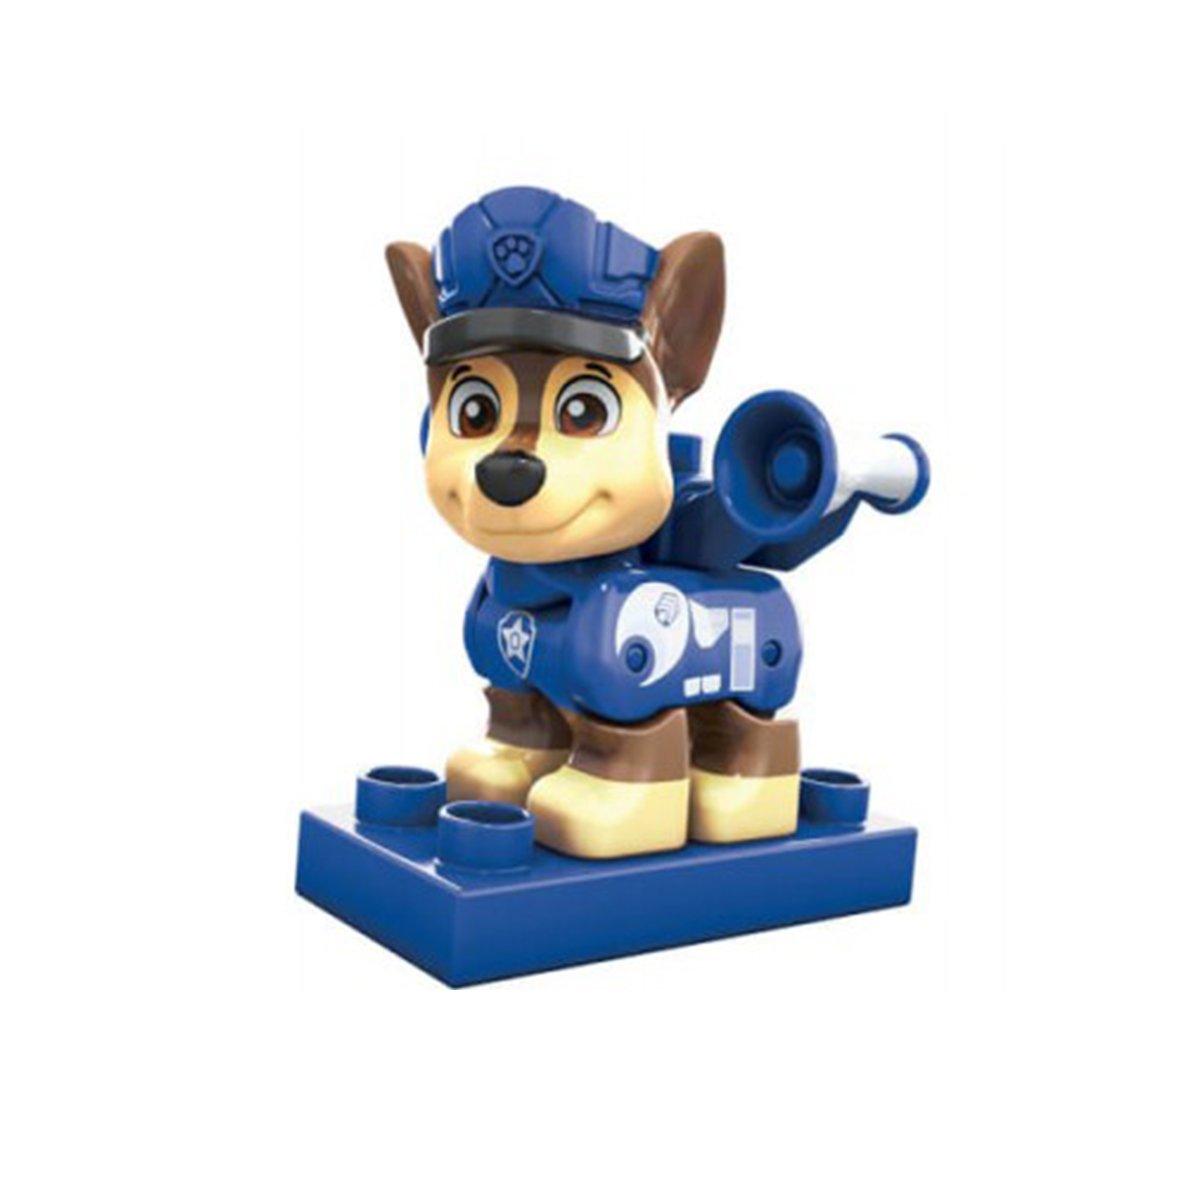 Figurina Megaconstrux, Paw Patrol, Chase